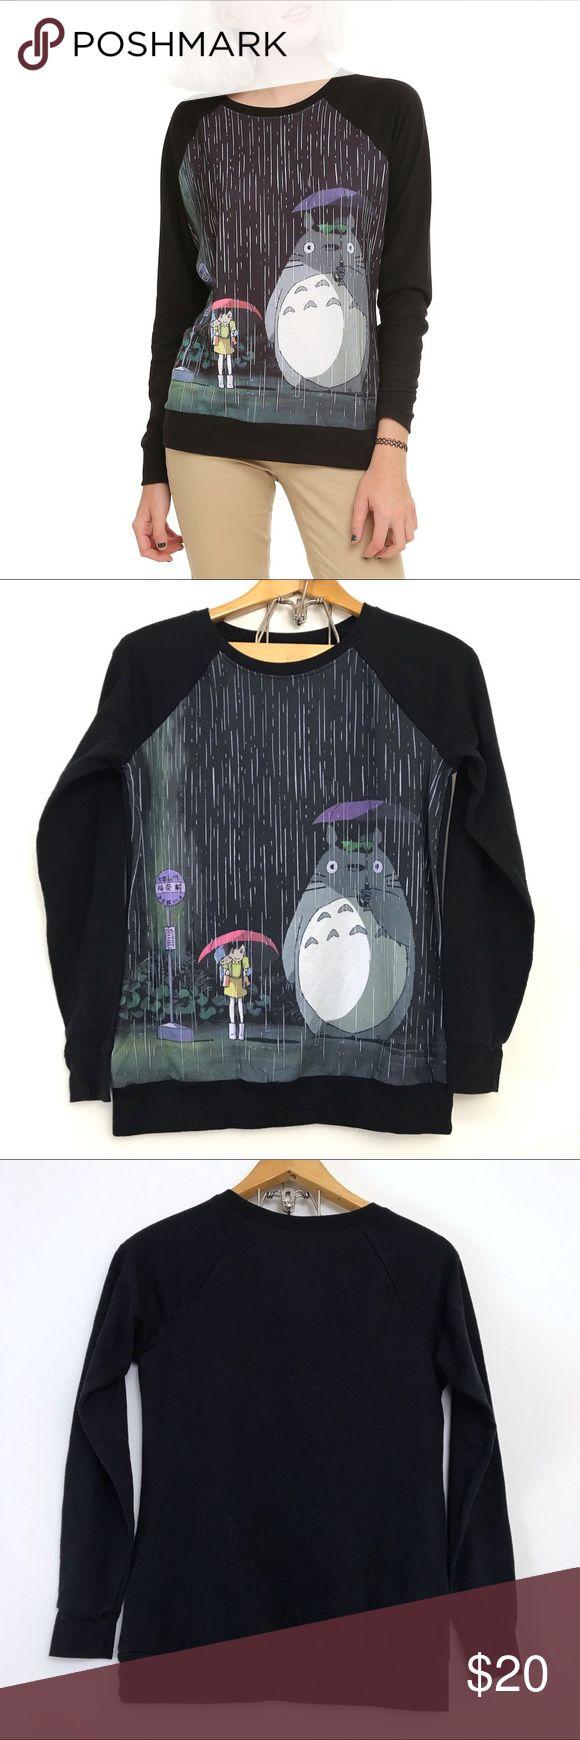 My Neighbor Totoro Studio Ghibli Pullover Sweatshirt Tops Novelty Sweater Clothes Design [ 1740 x 580 Pixel ]